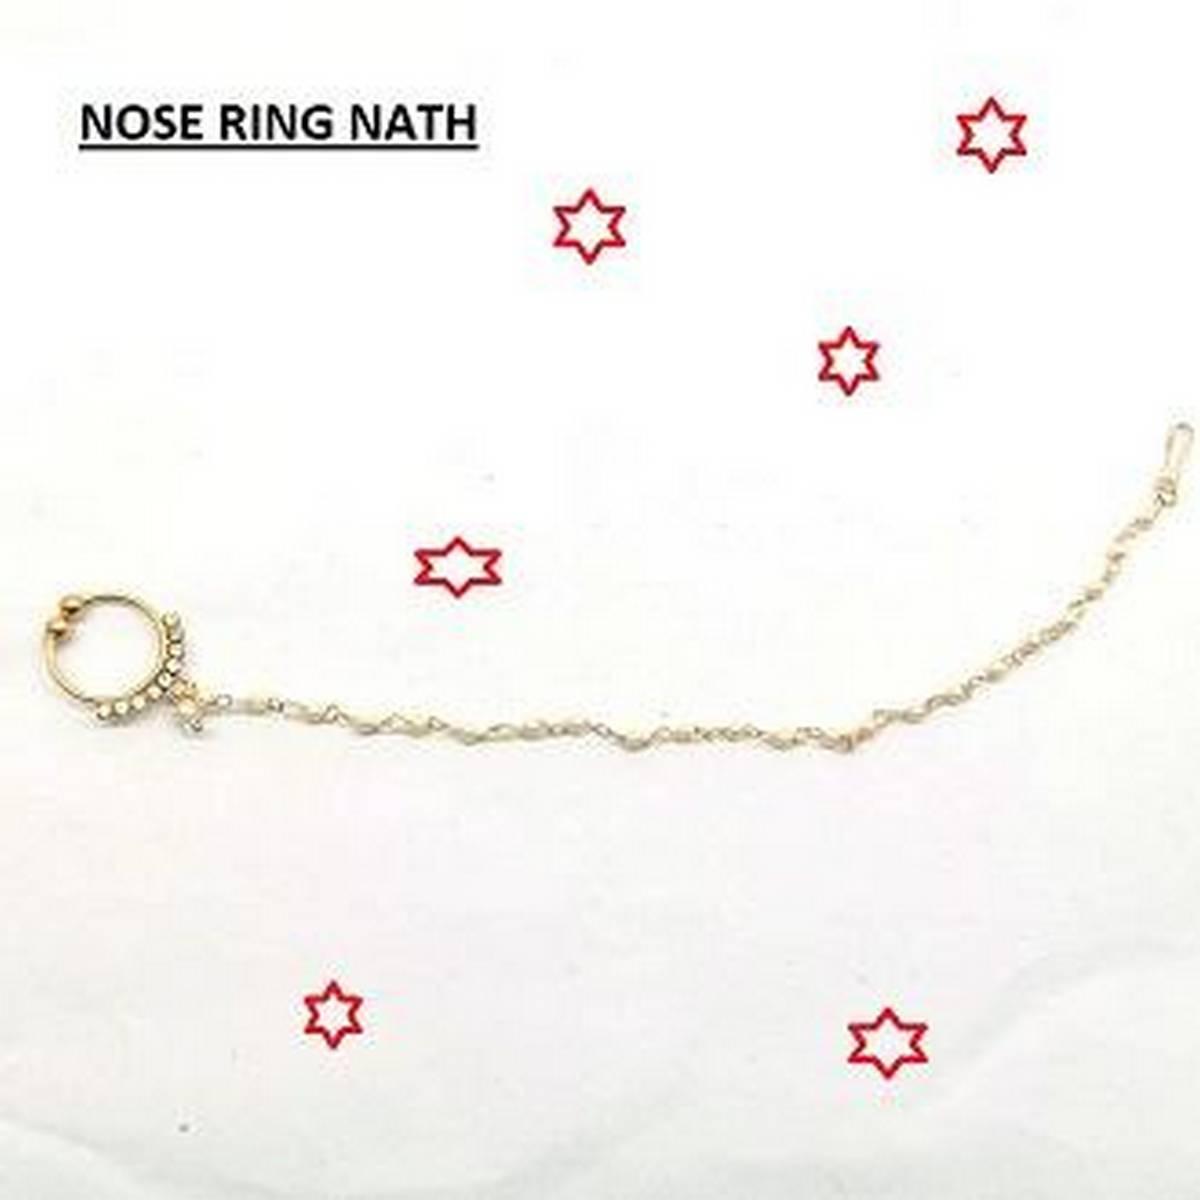 golden chain nose ring for women